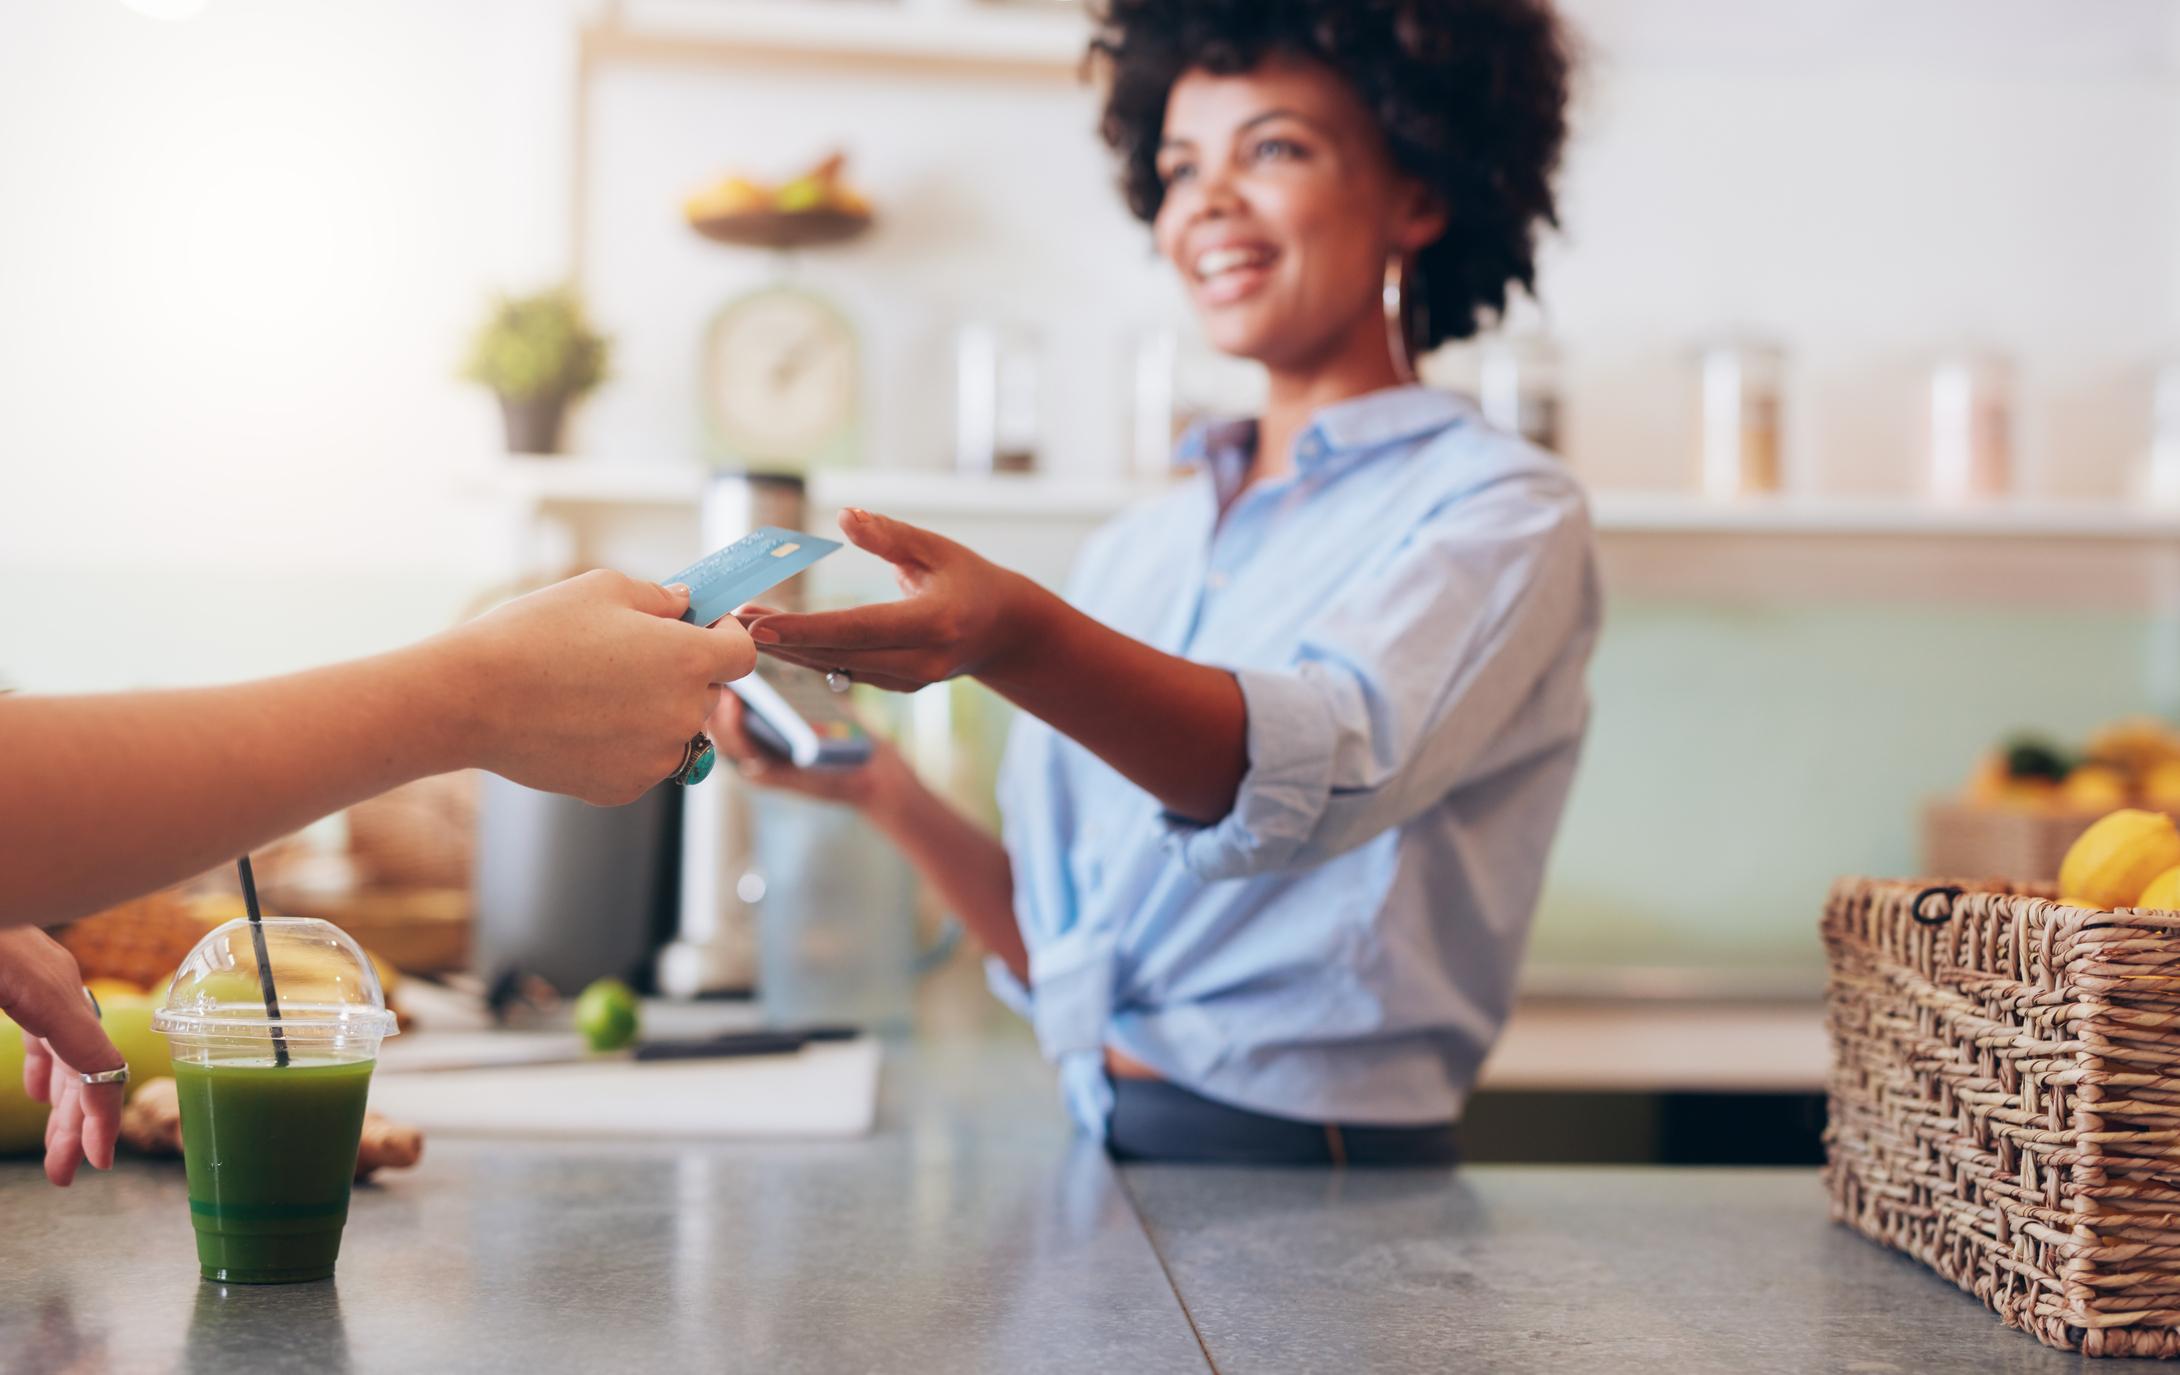 Customer handing employee a credit card